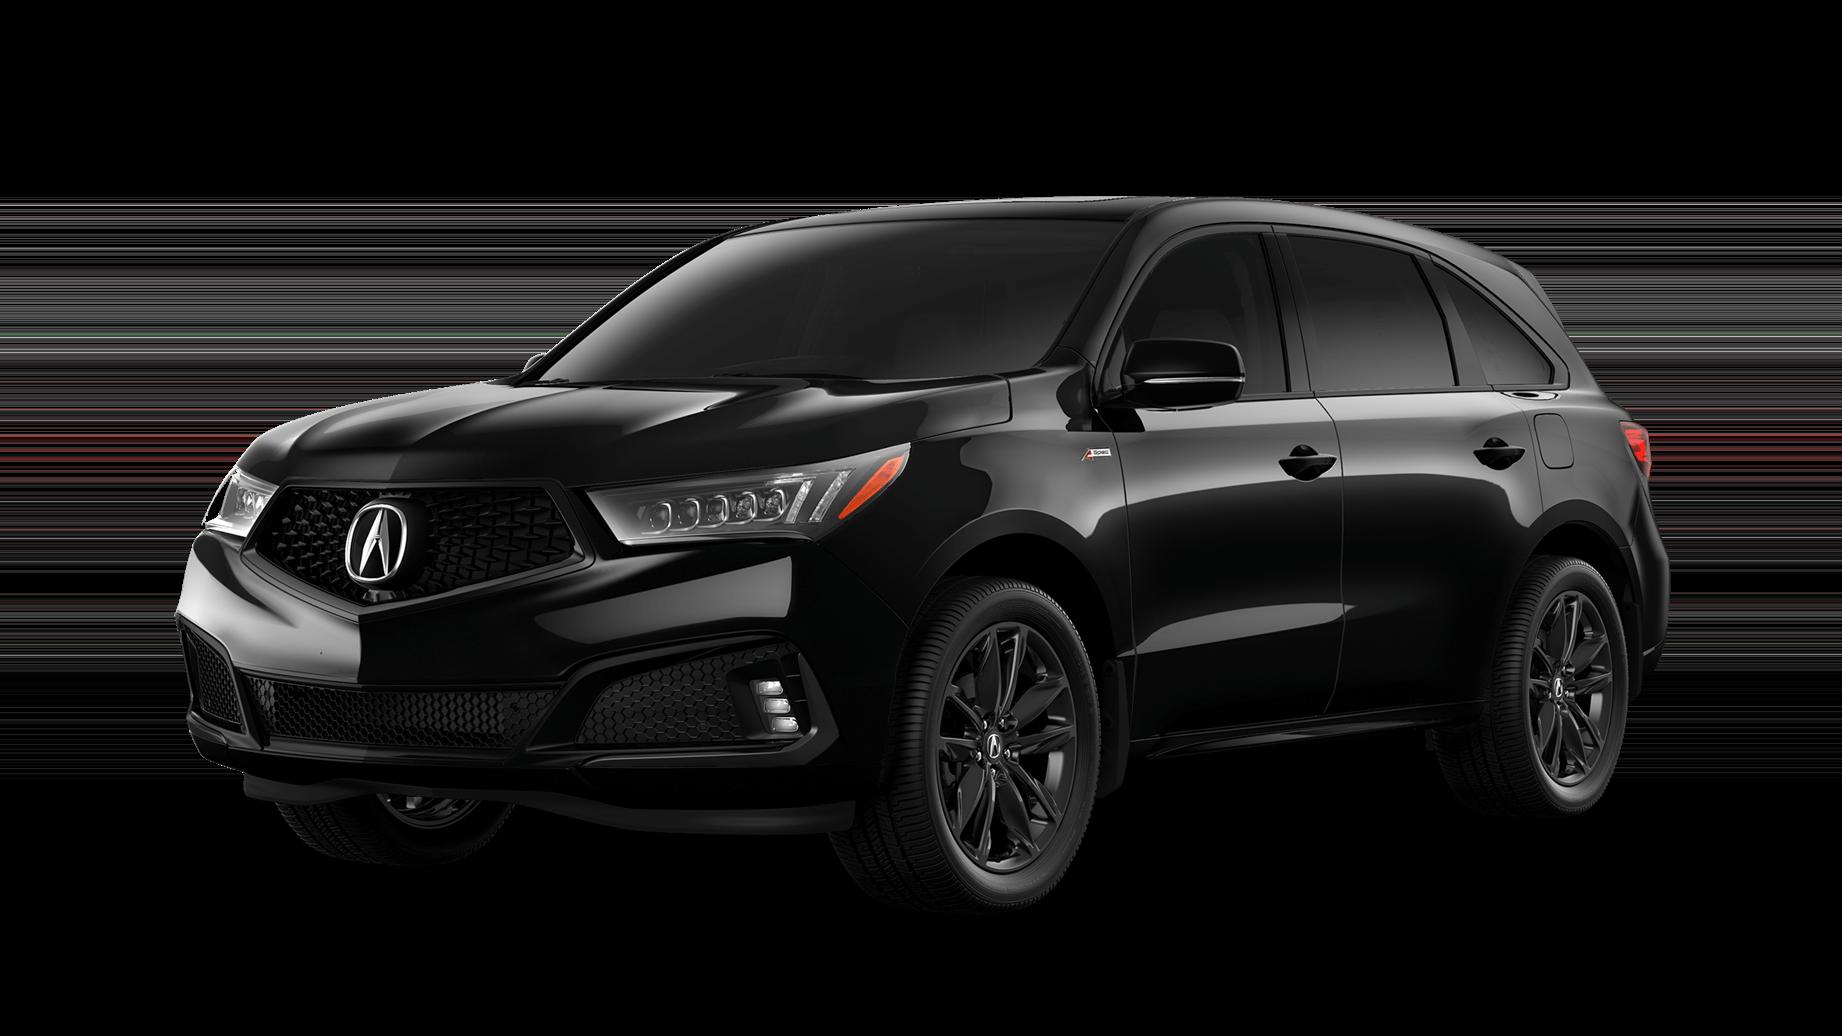 Black Acura MDX A-spec